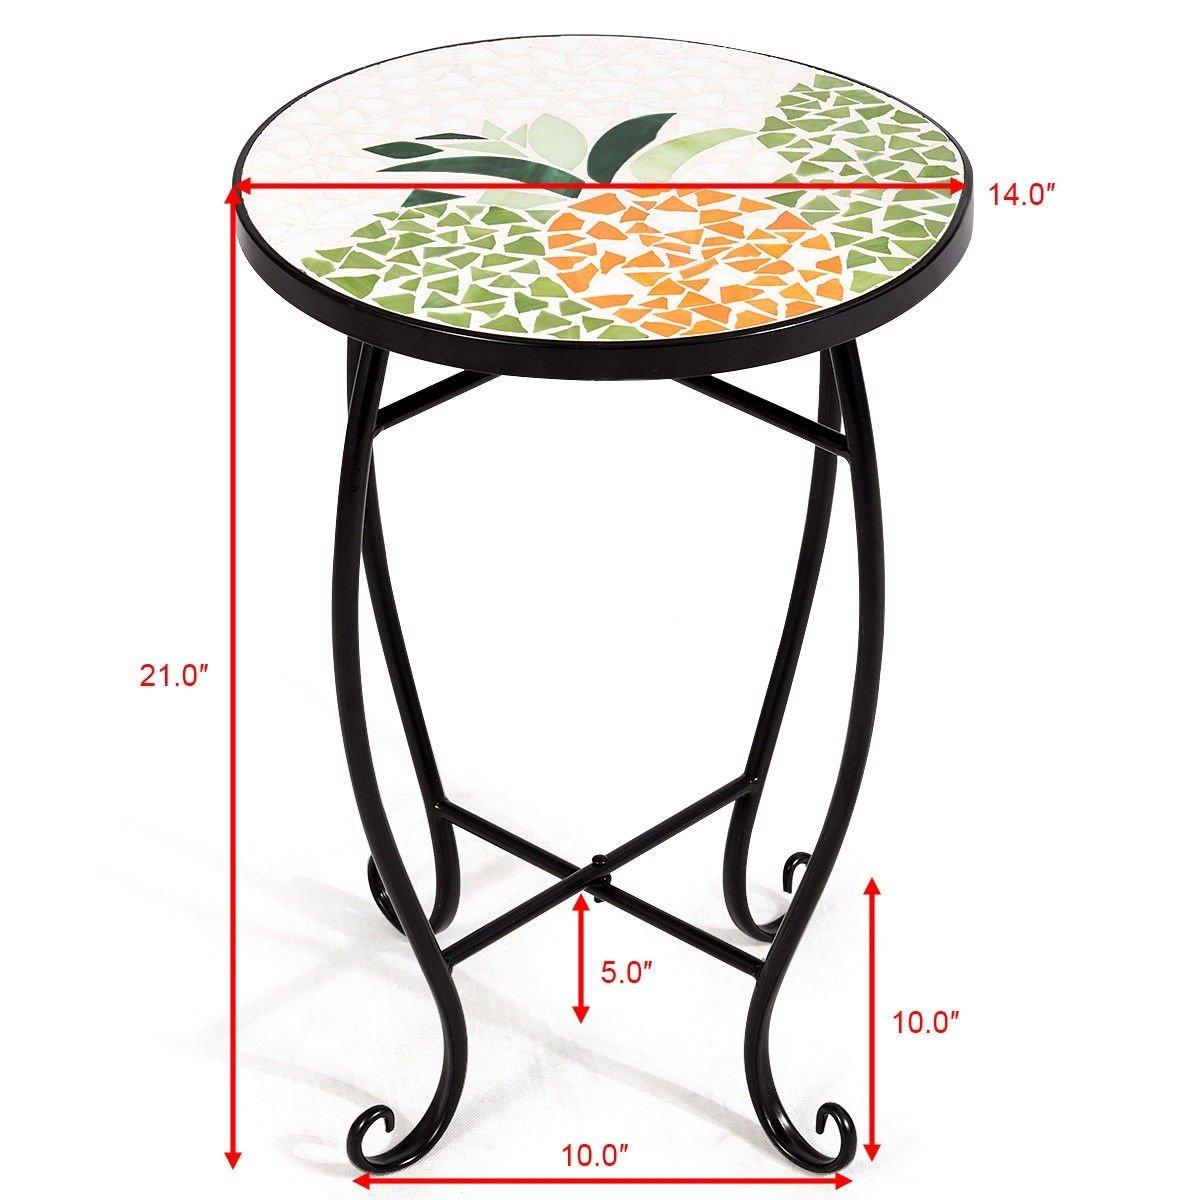 custpromo mosaic accent table metal round side outdoor plant stand cobalt glass top indoor garden patio sweet pineapple kitchen meyda tiffany lamp bases target recliners kirklands